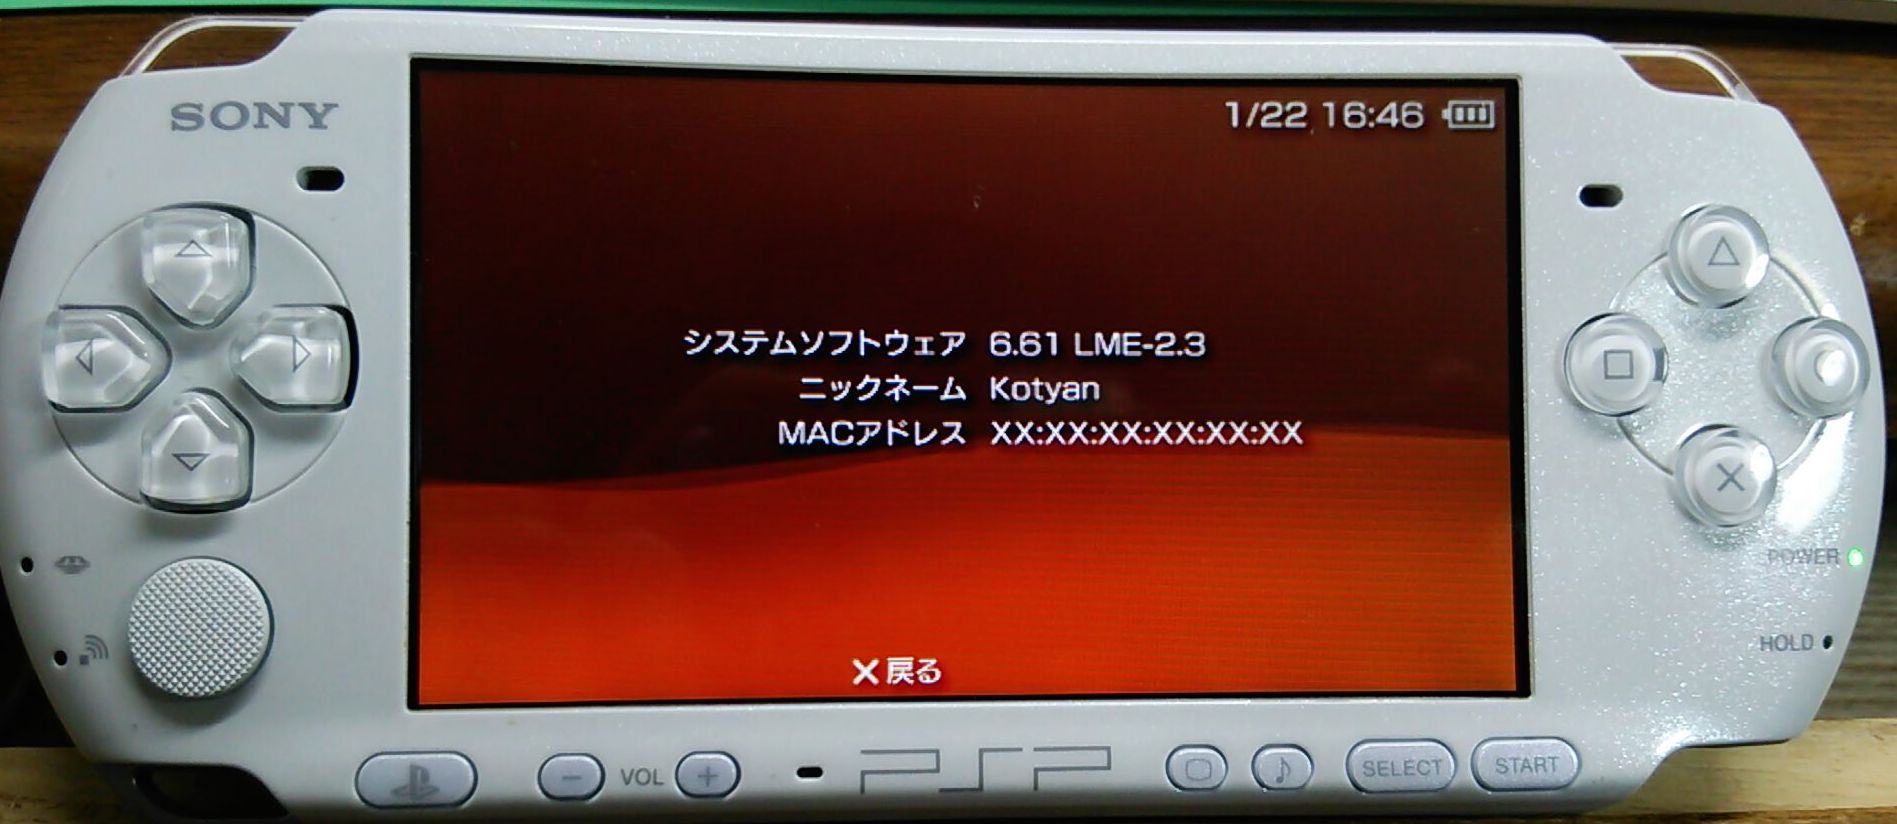 CM150122-164159004